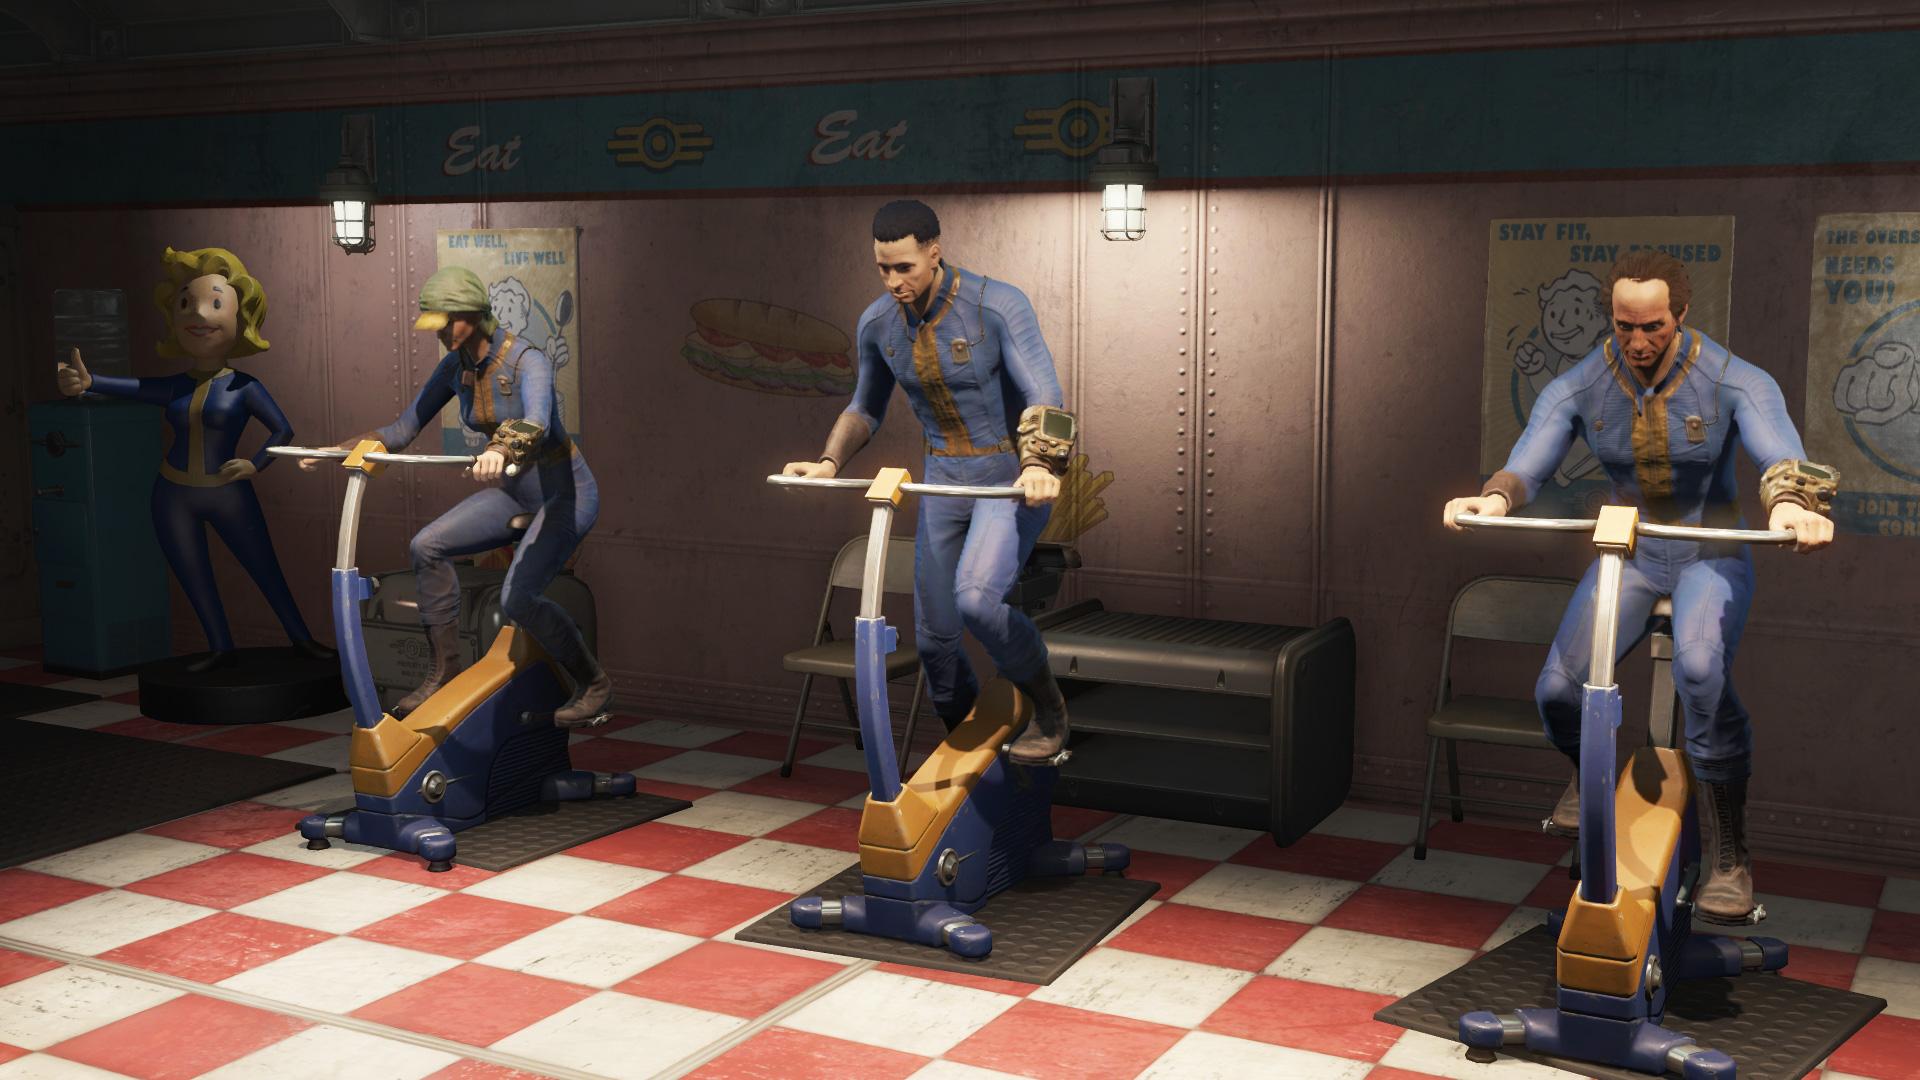 Bethesda Softworks LLC  Online Store - Fallout 4 - Vault-Tec